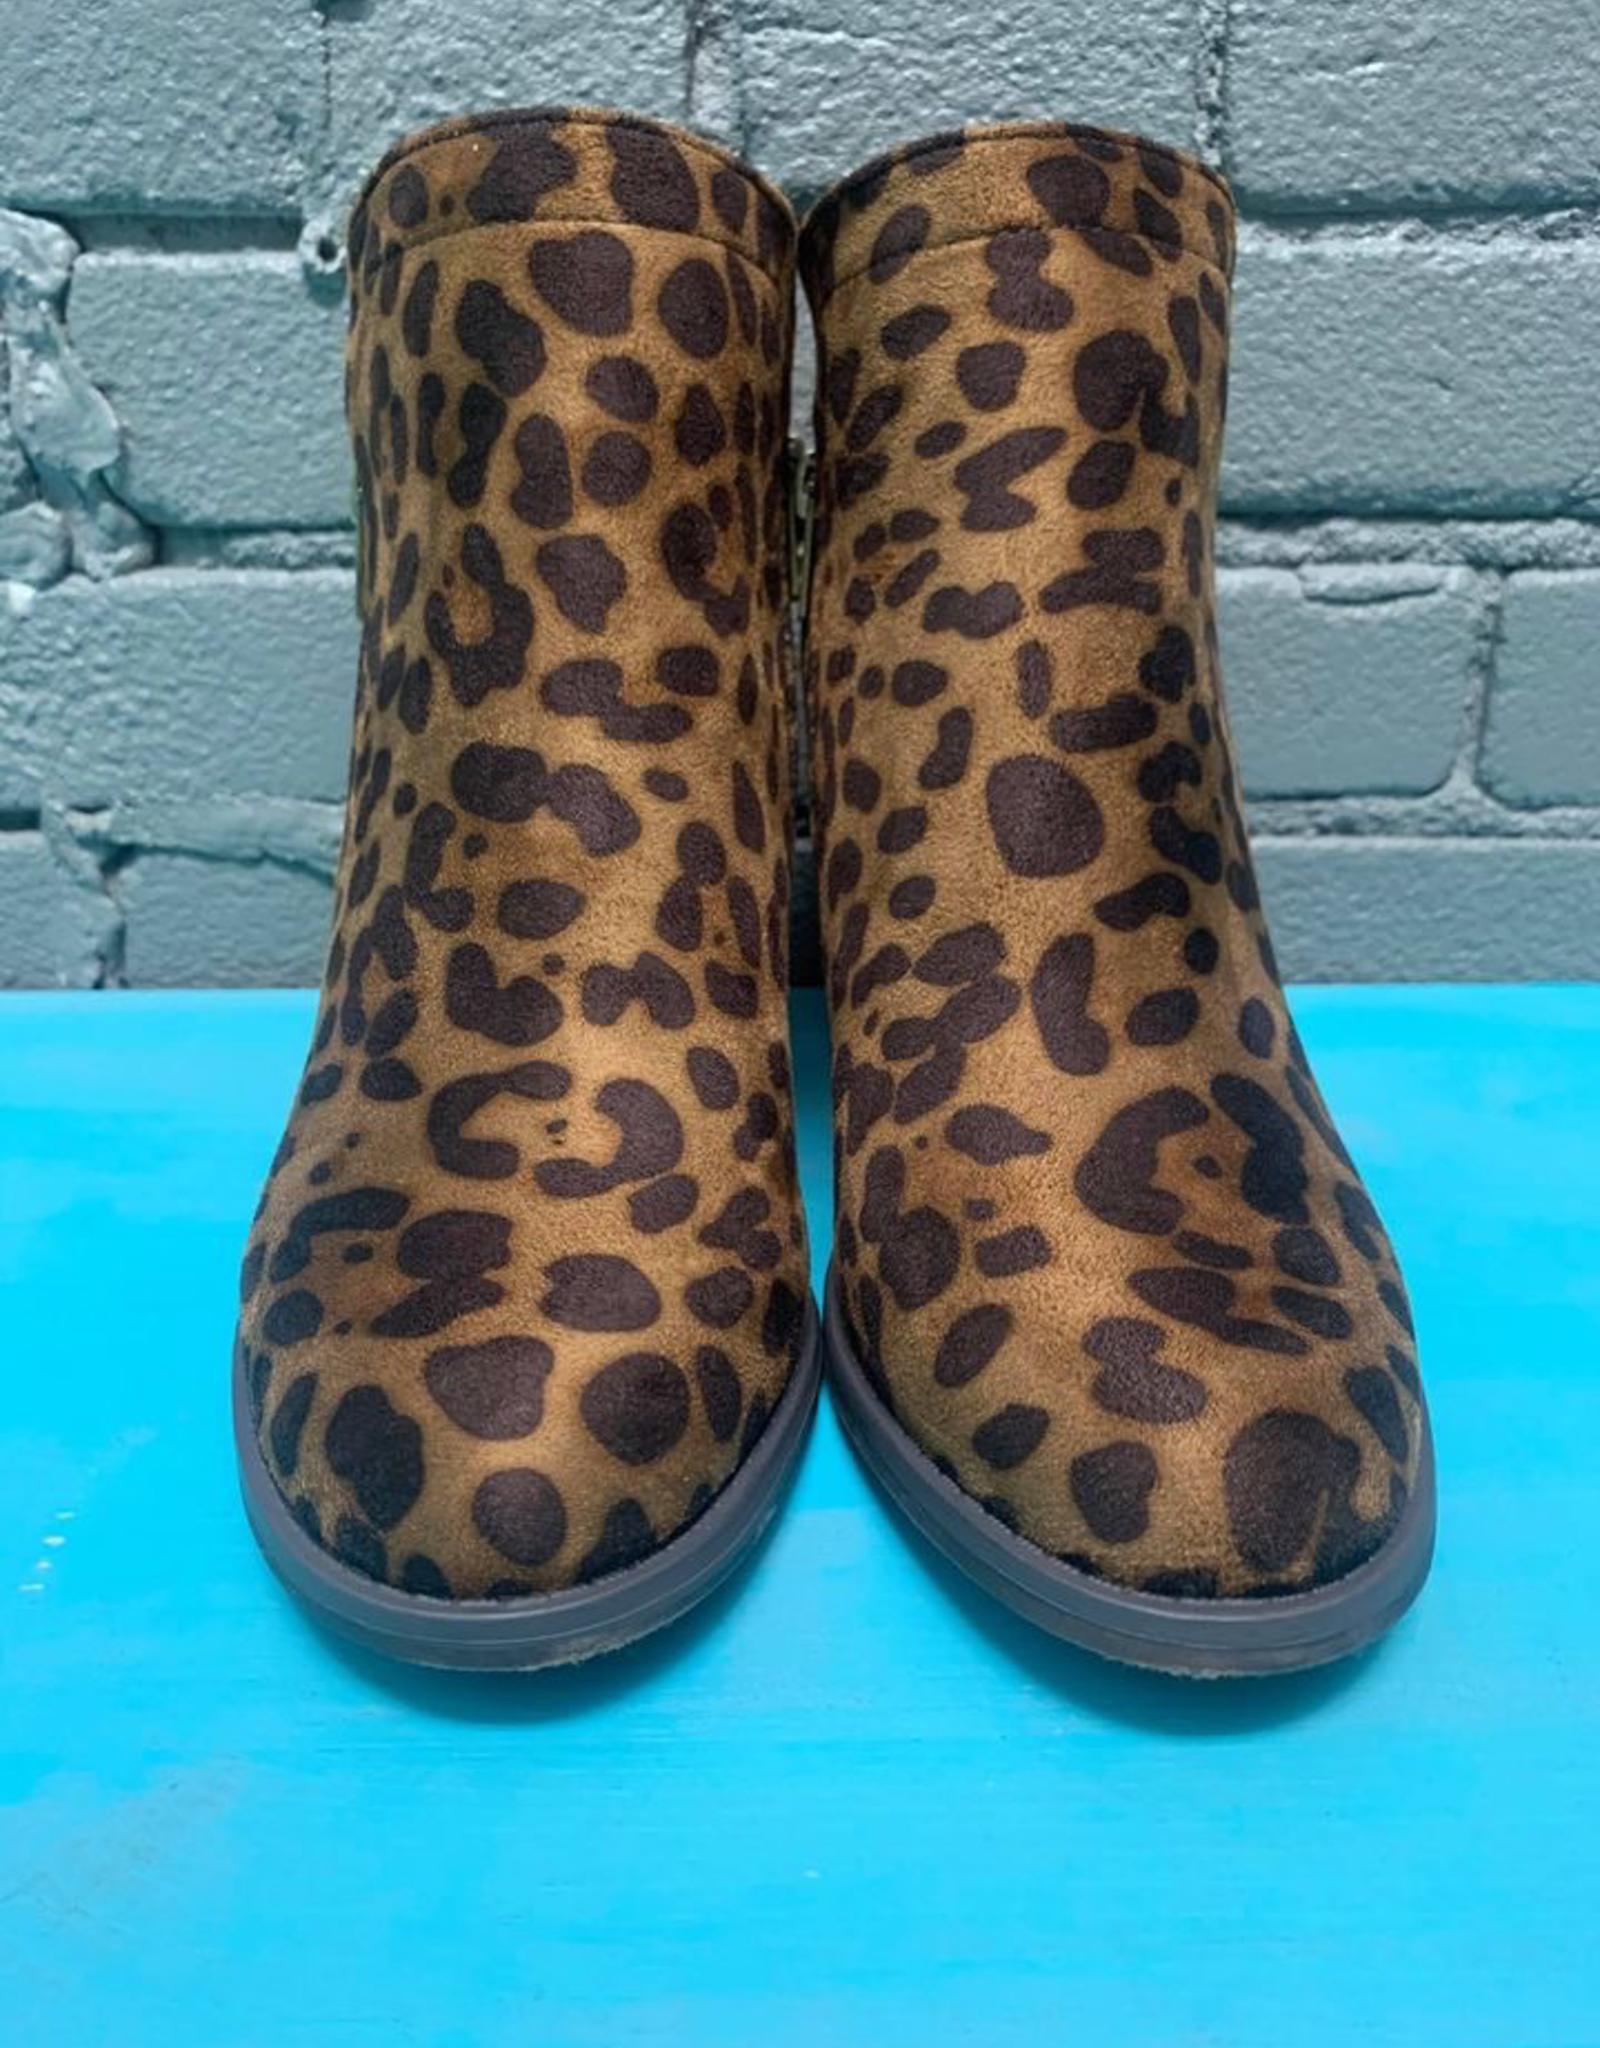 Shoes Leopard Booties w/ Side Zippers